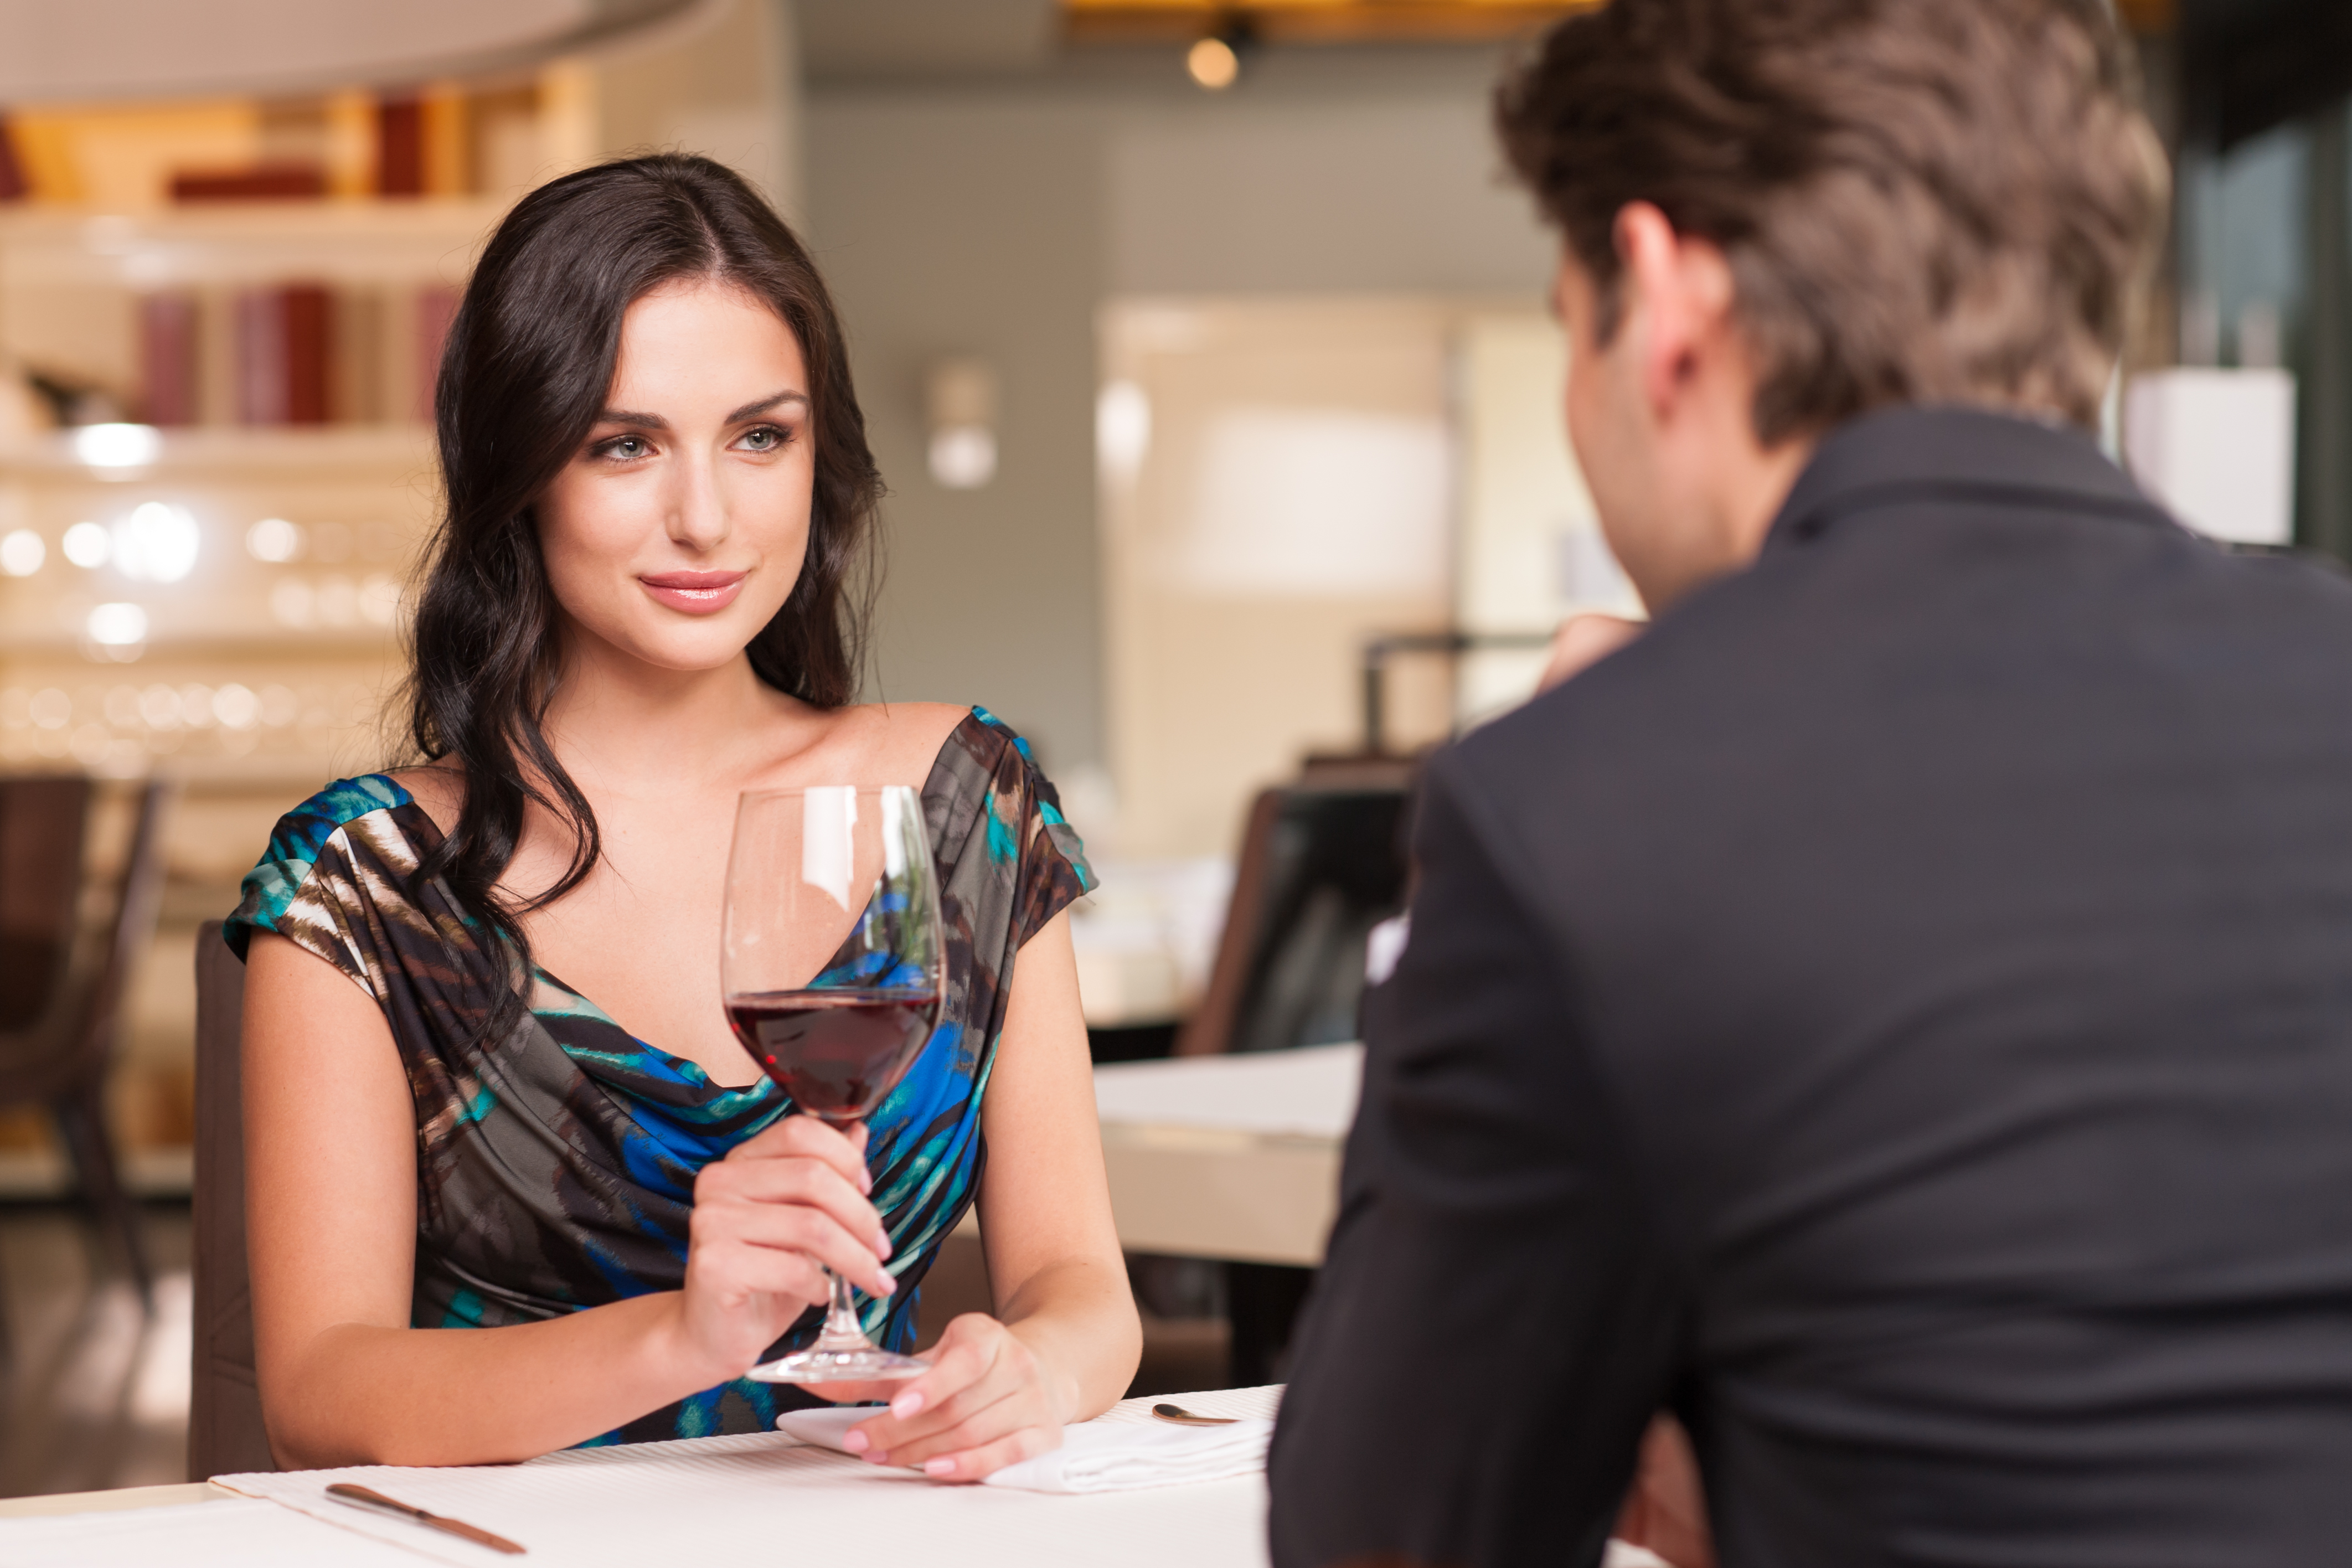 Funny tale om dating mastektomi dating